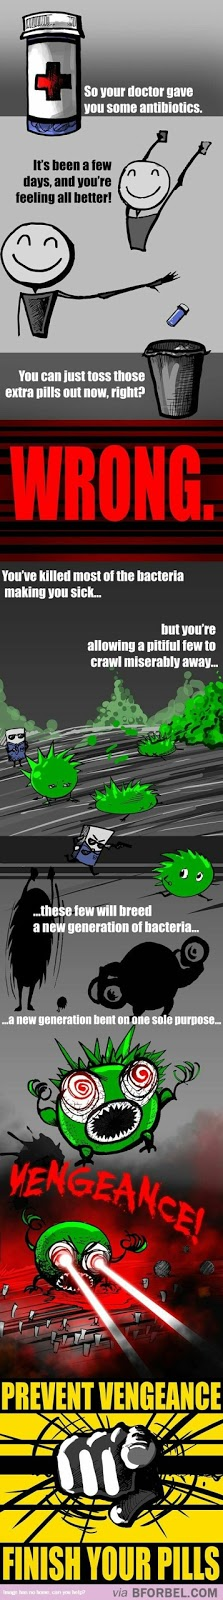 A post Apocalypse worse than zombies…